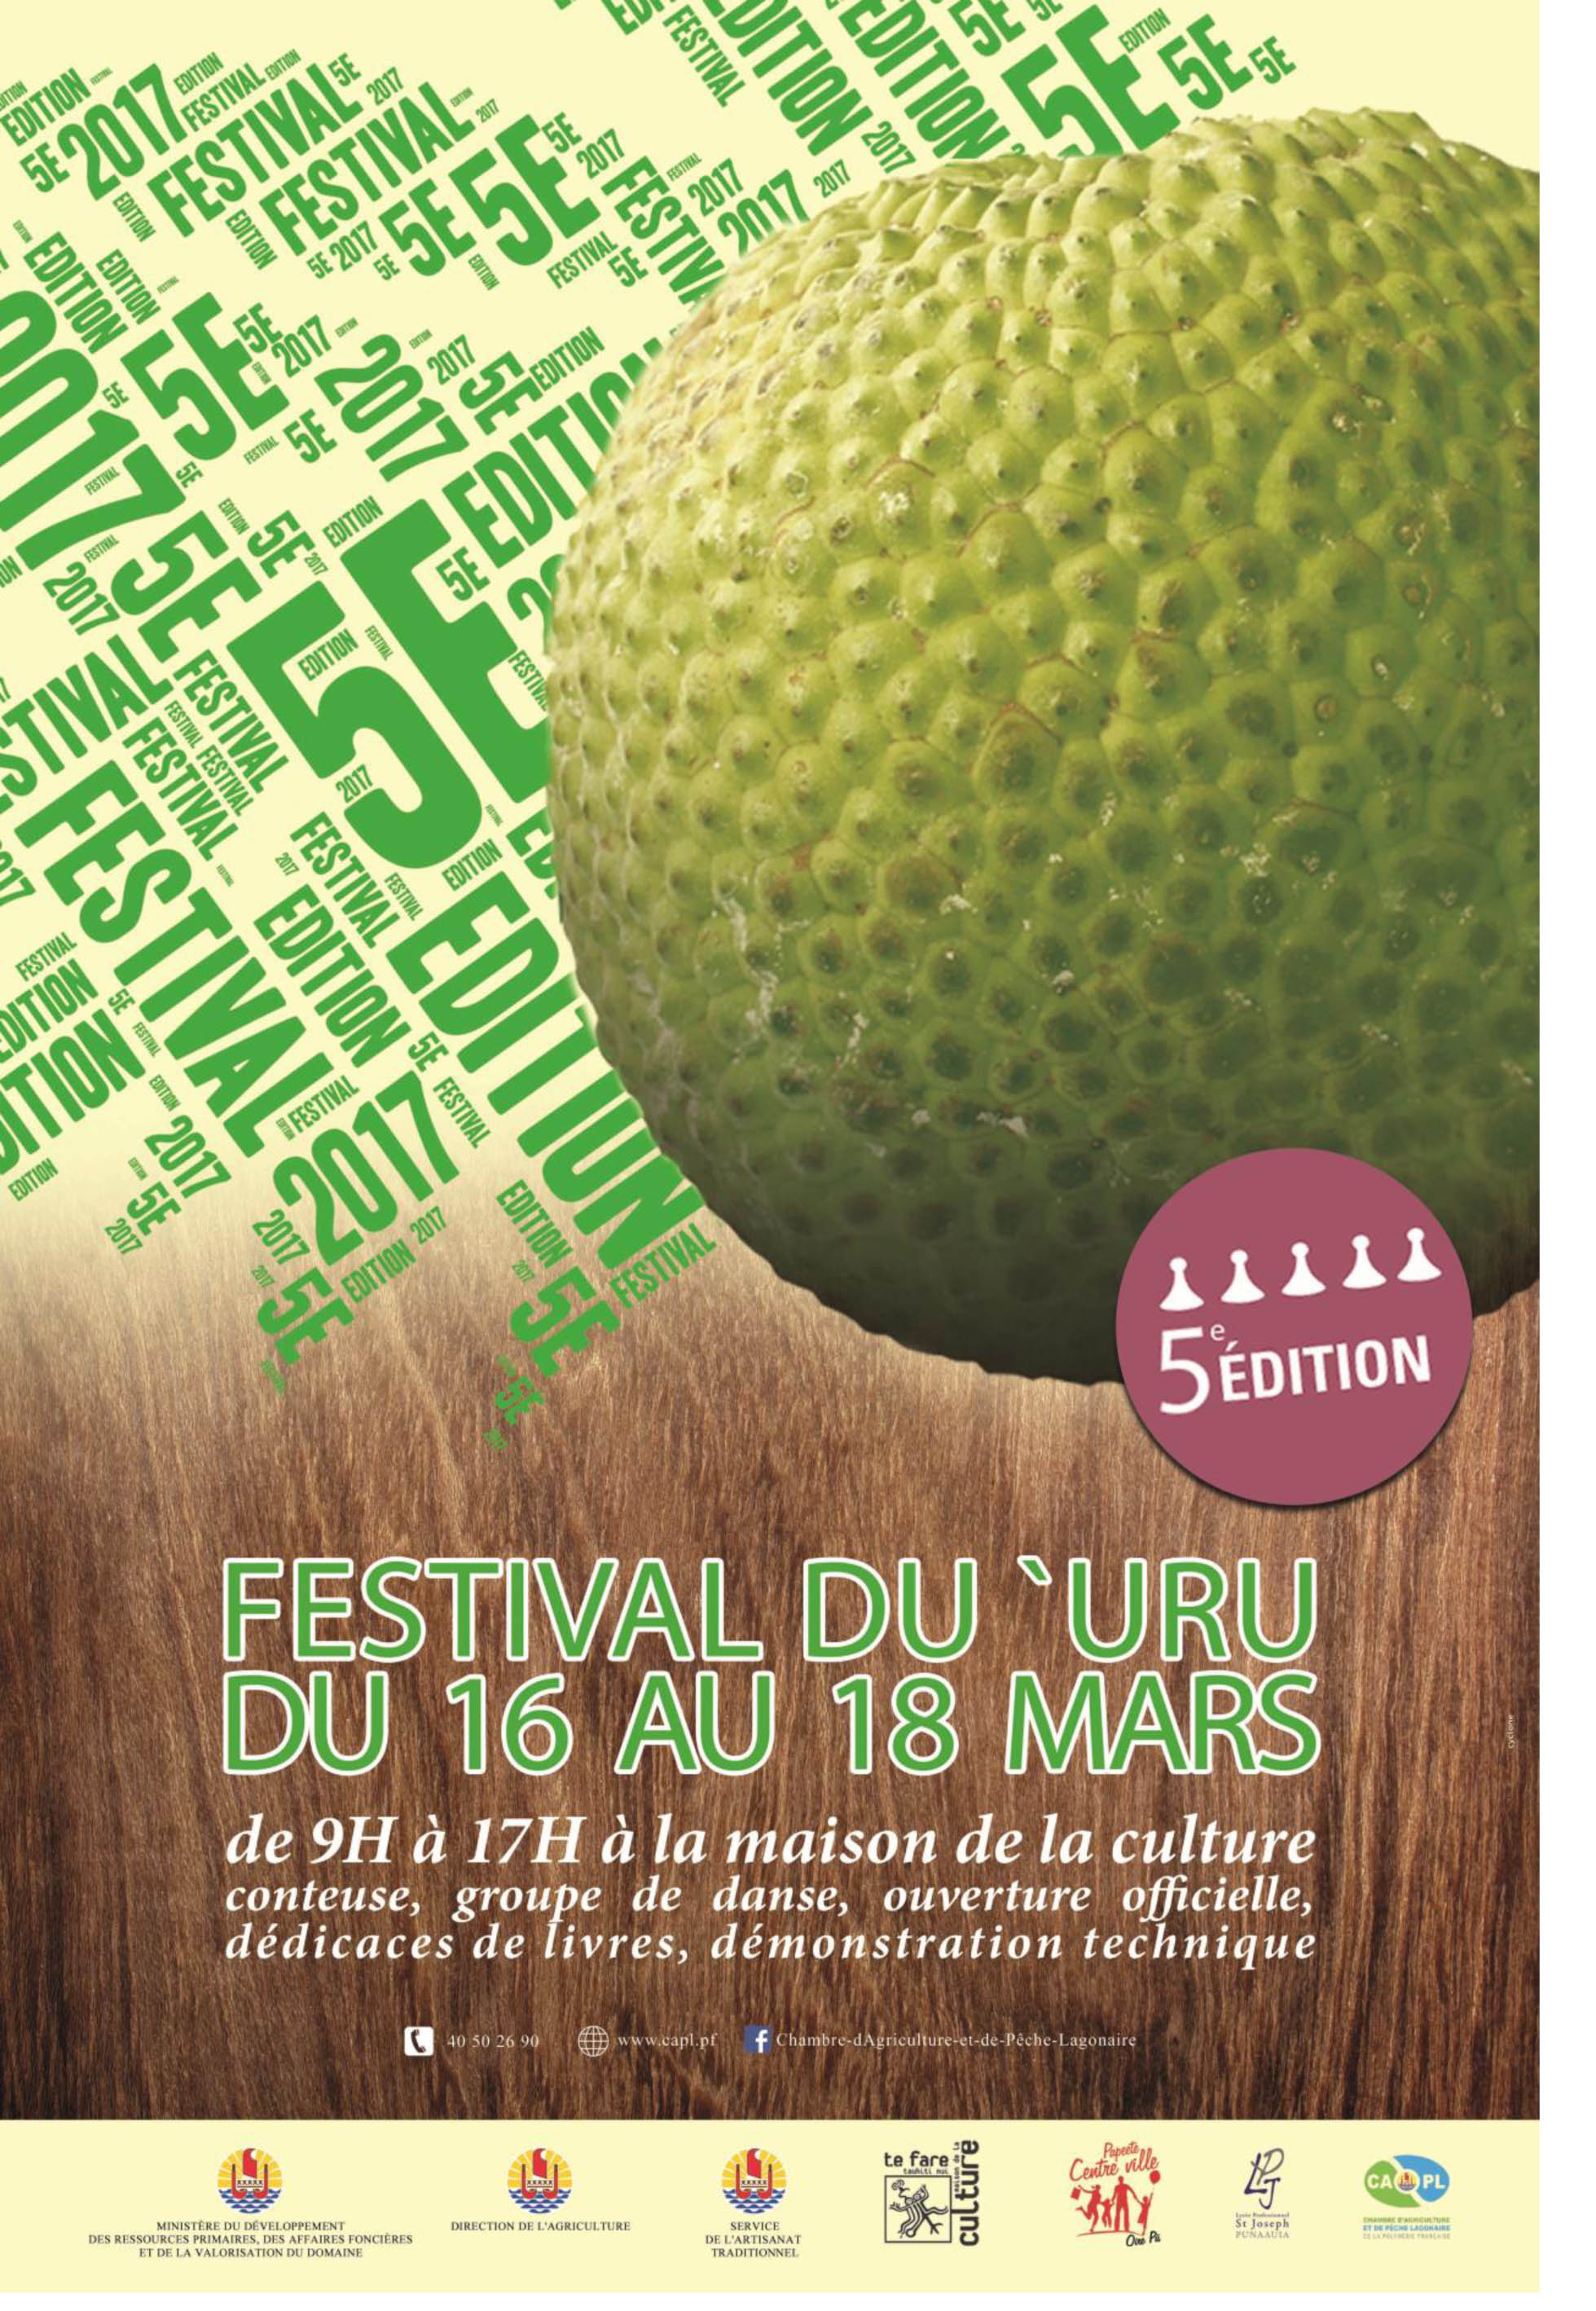 Festival du uru 2017